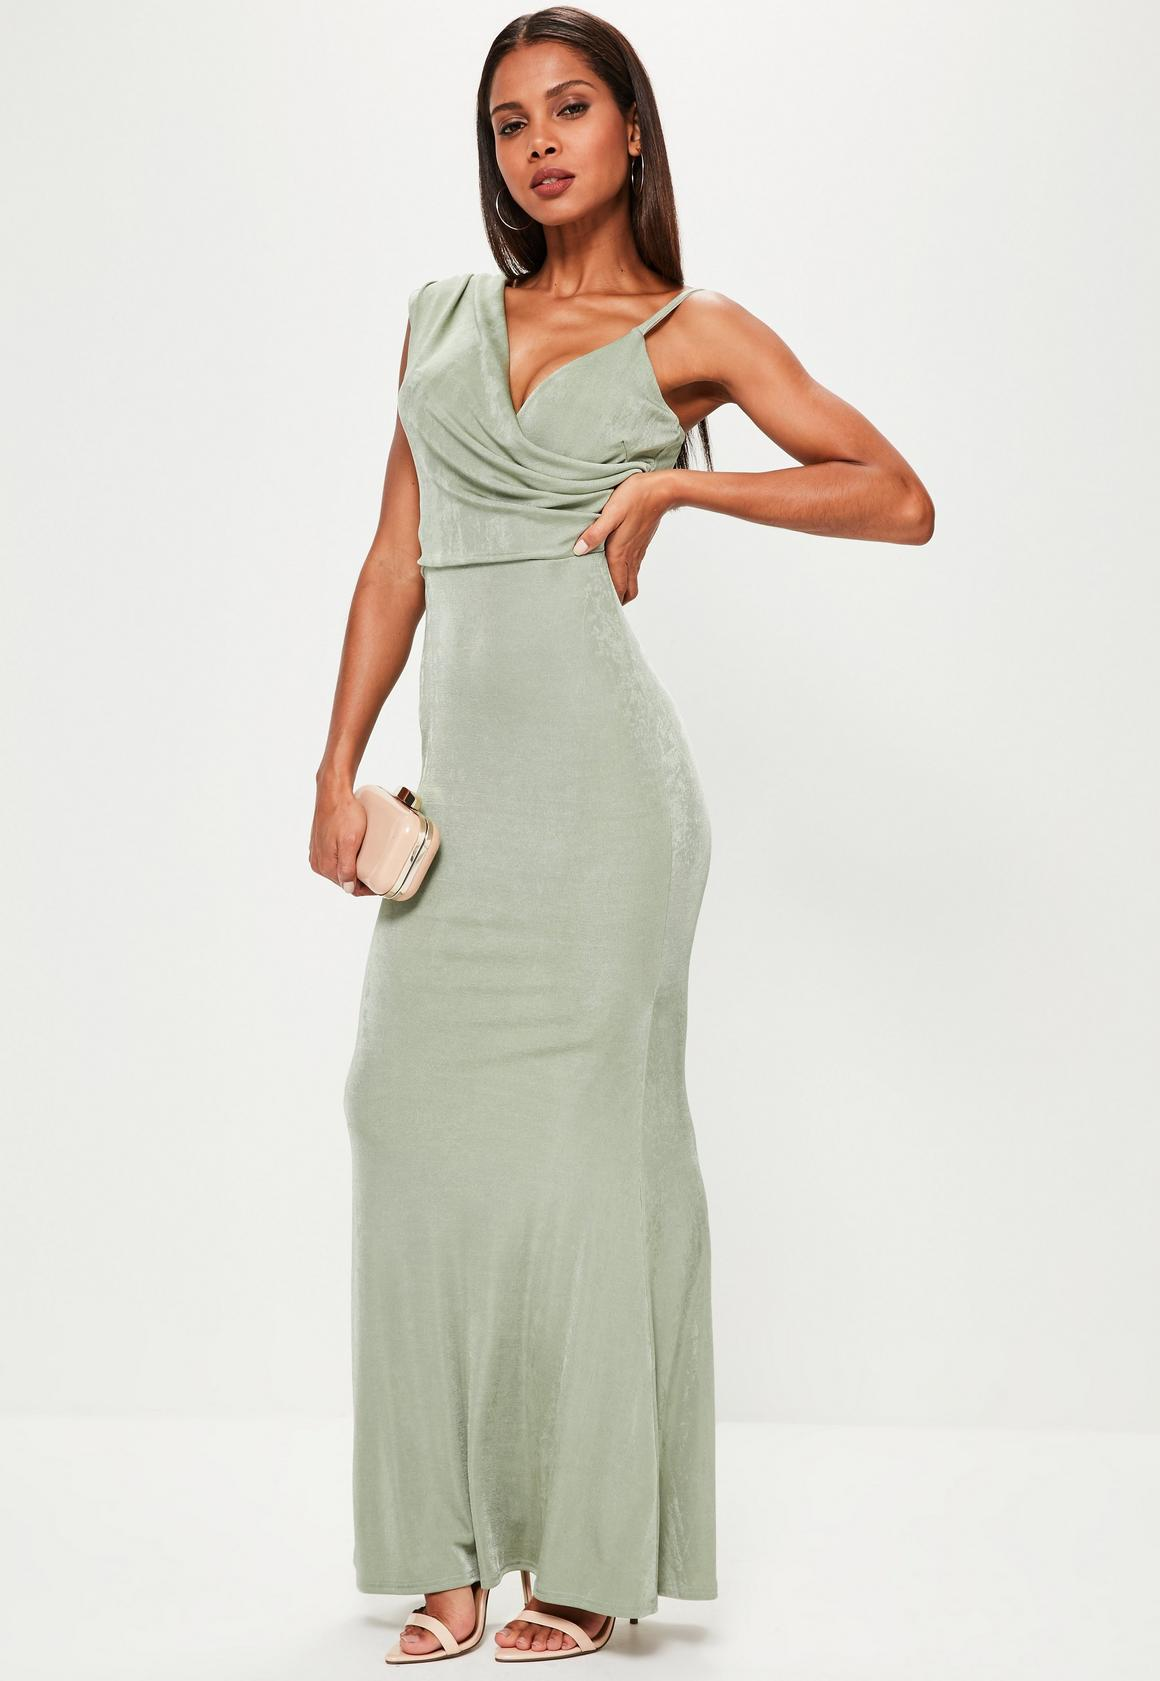 20e4e37ddc Wspólne Sukienka Asymetryczna DłUga TQA35